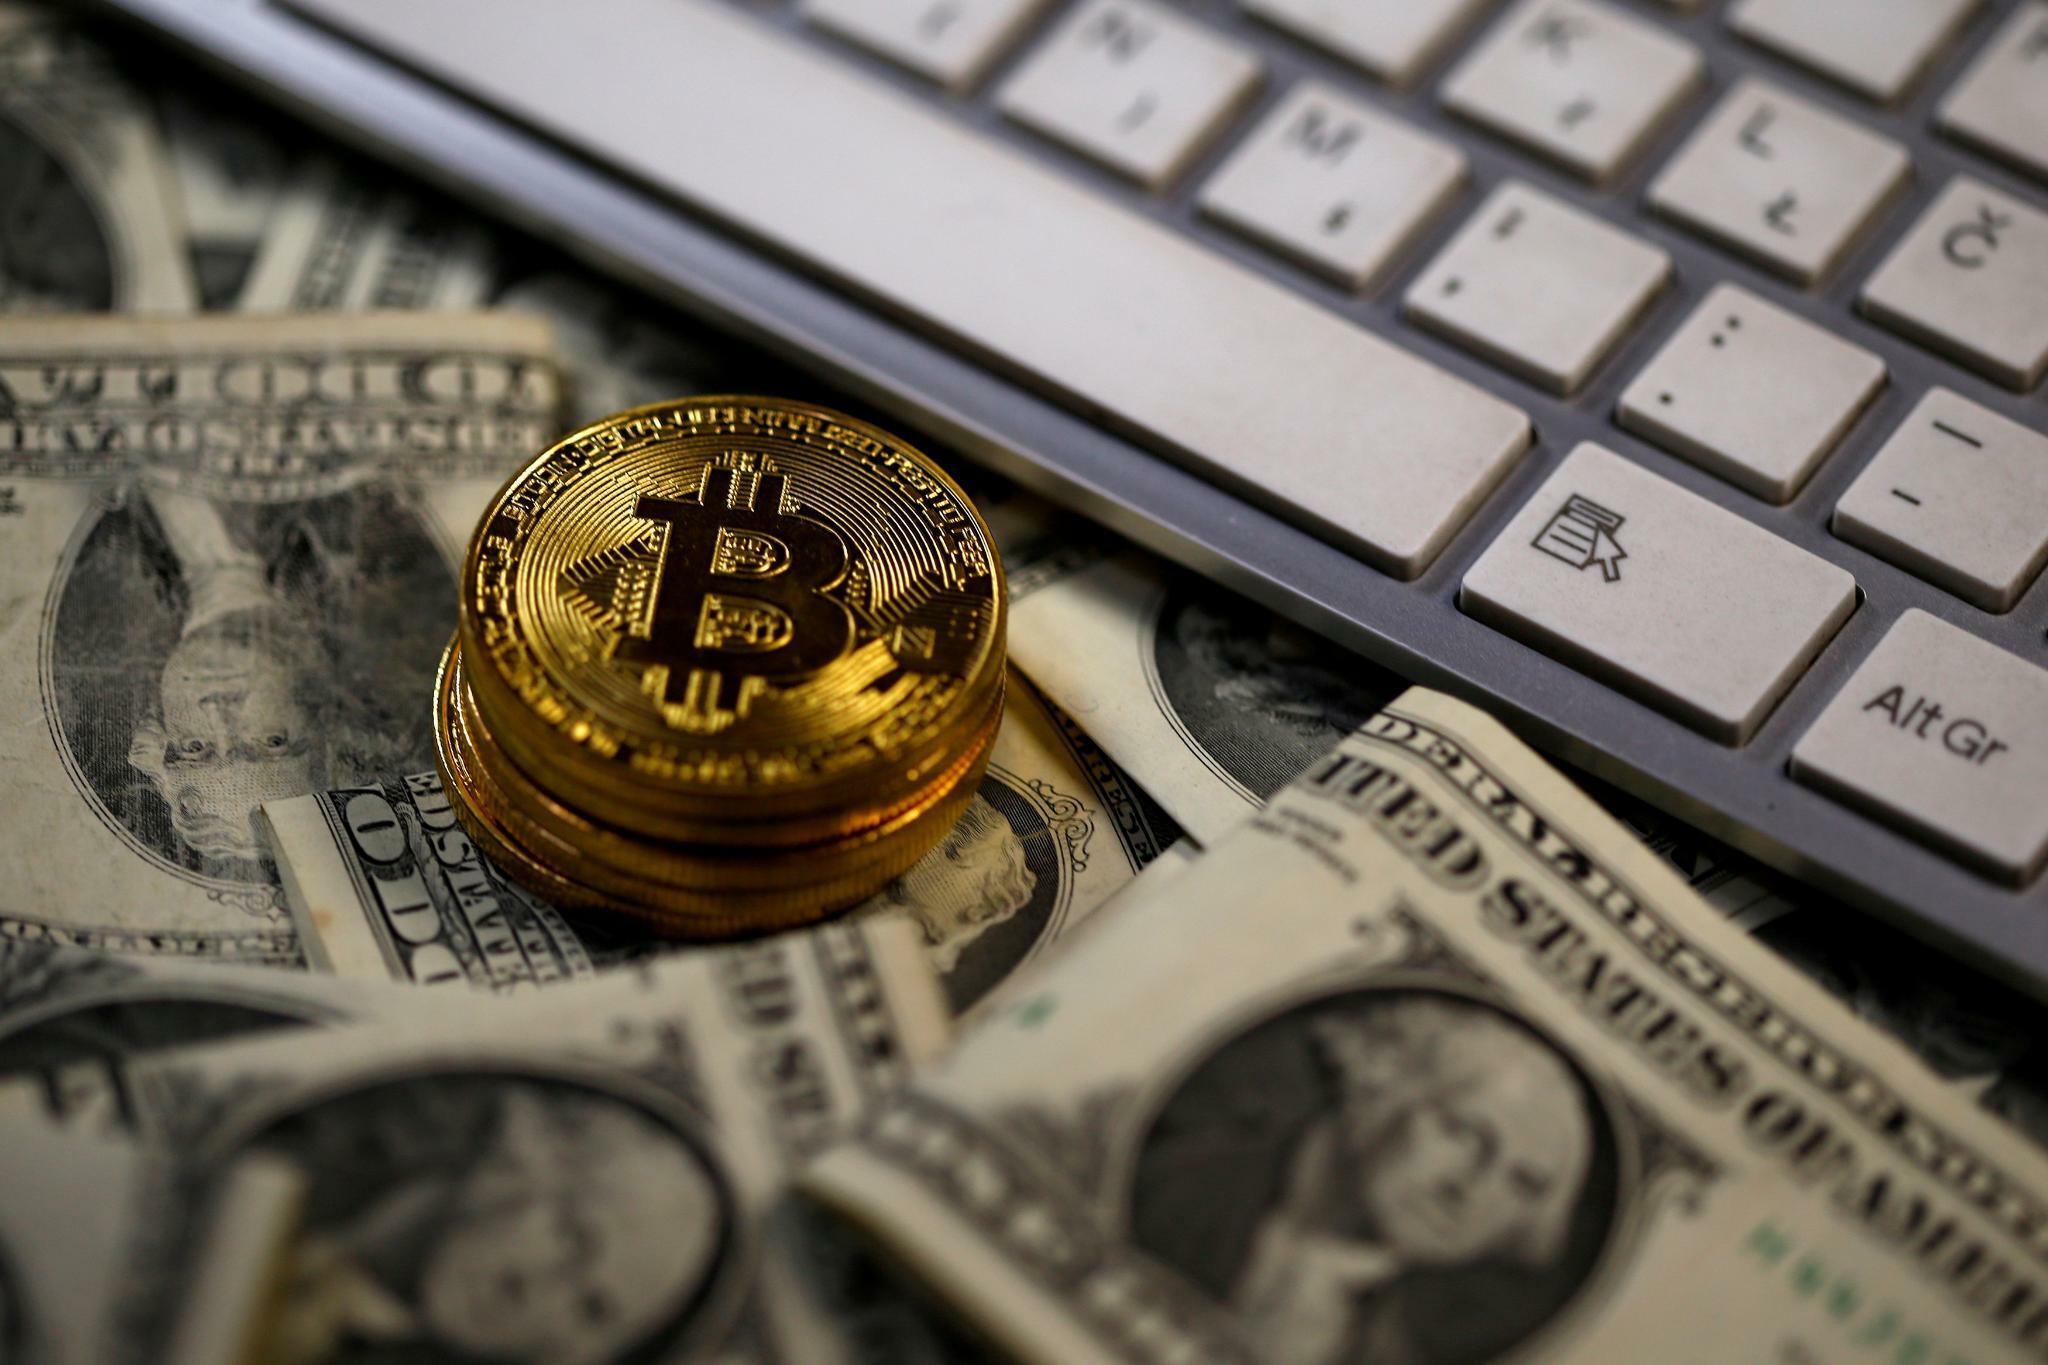 binäres handeln was ist das pen man wegen bitcoin-handels verurteilt